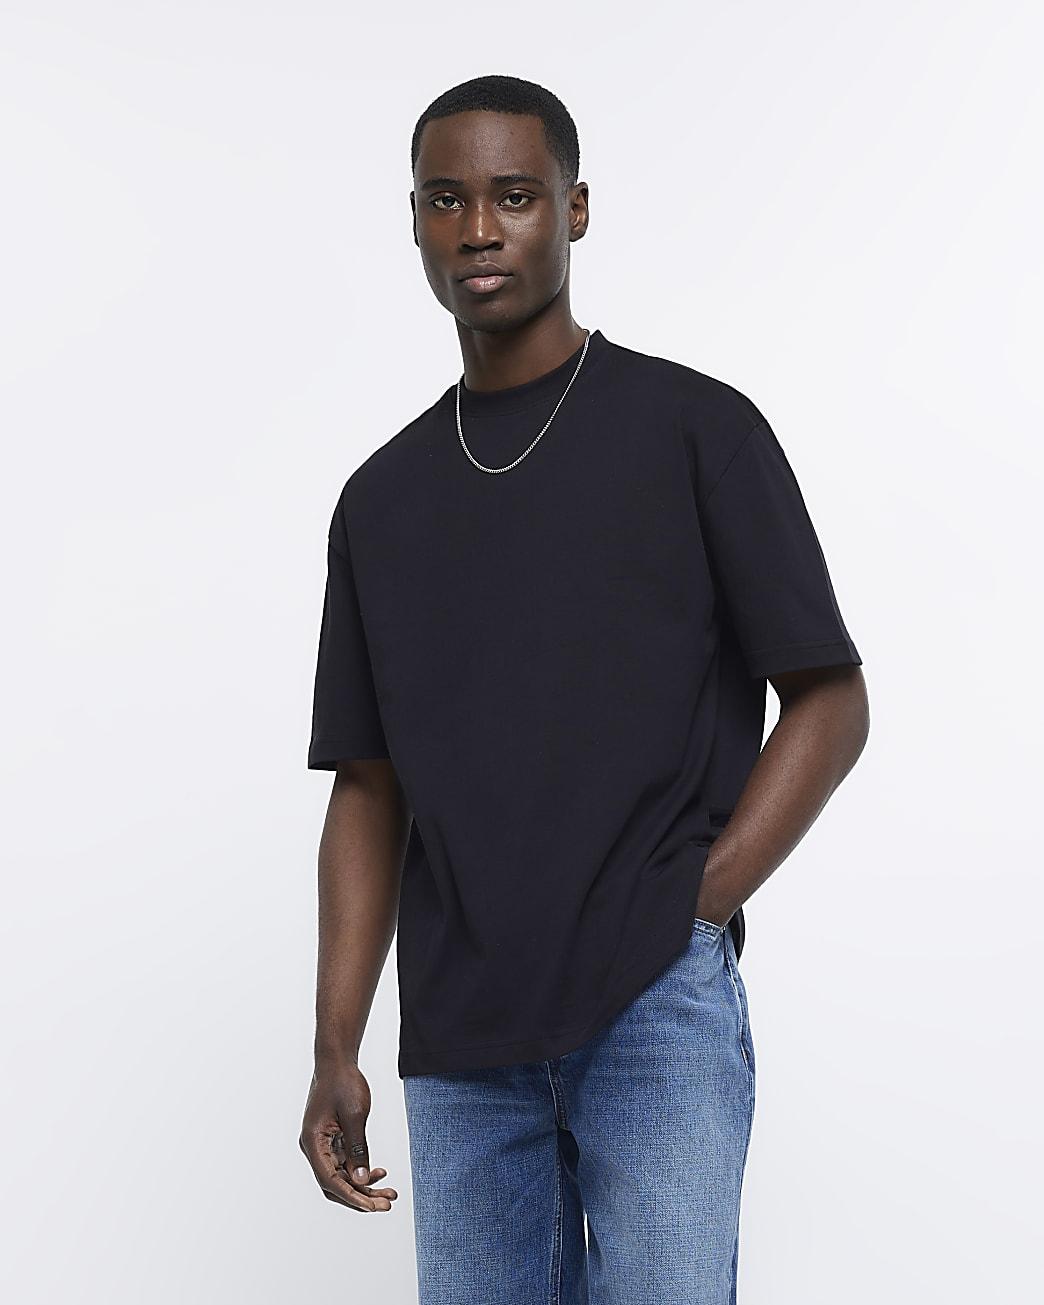 Black RI Studio oversized fit t-shirt